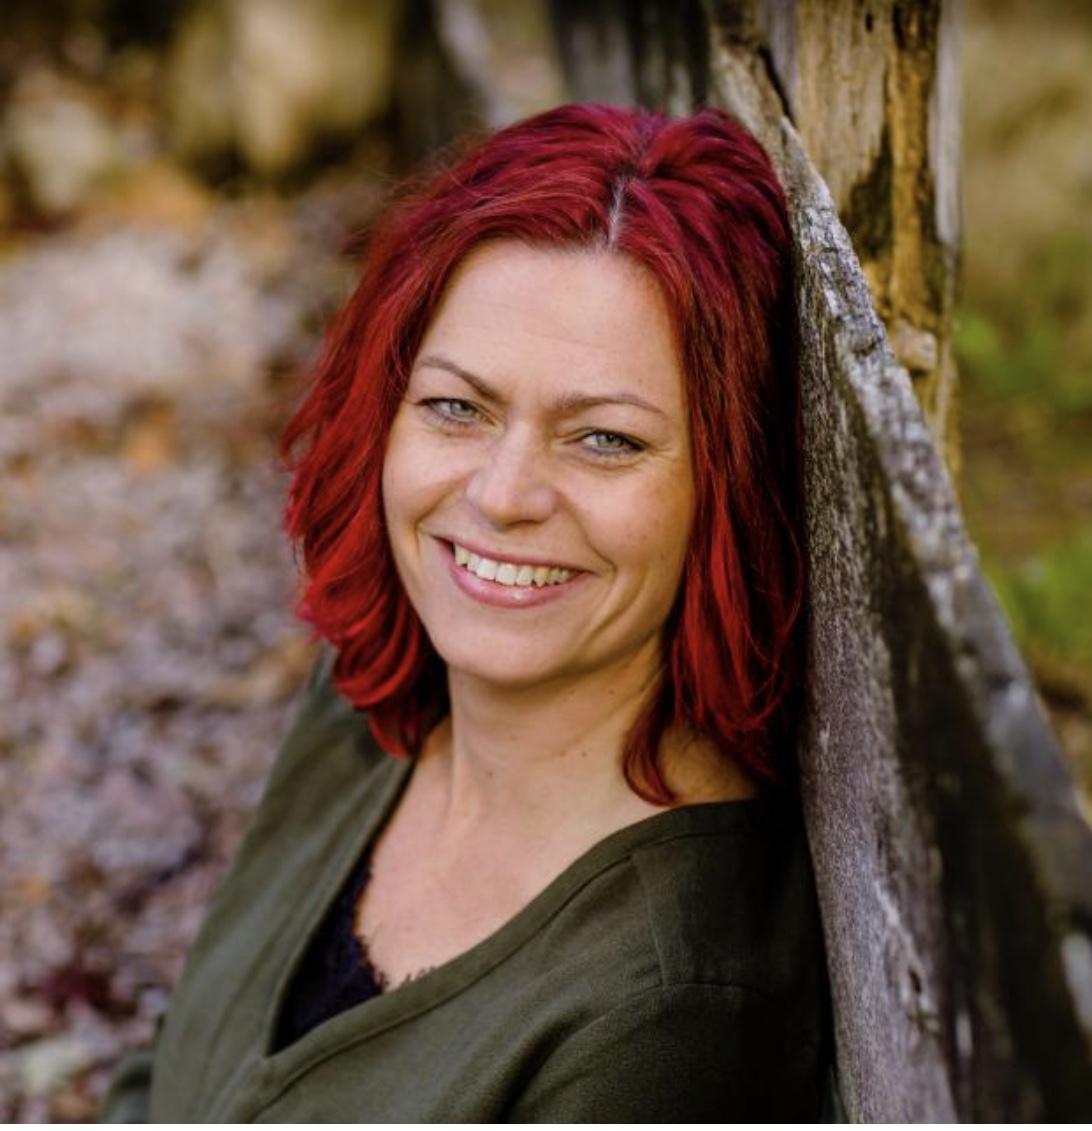 Sonja - Kapper bij Happy Hairdo Heino